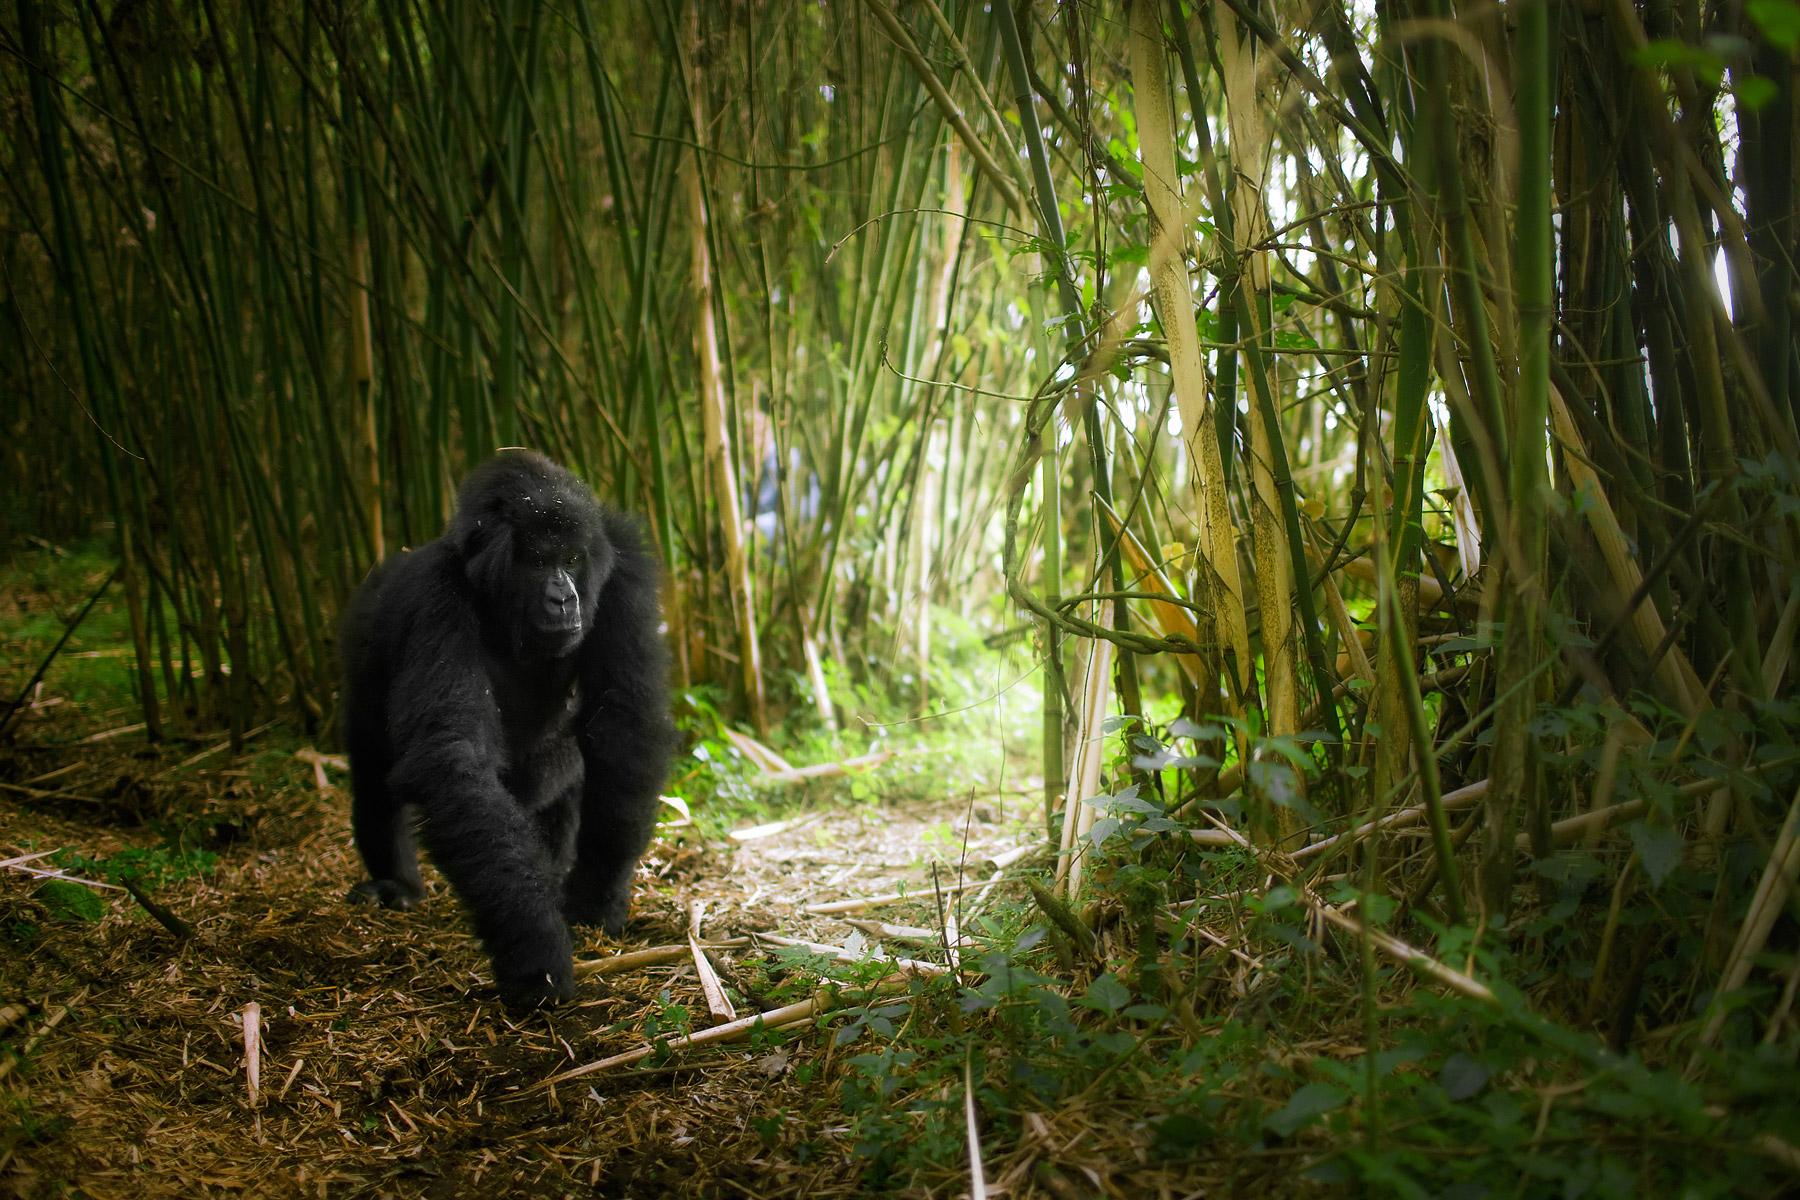 RWANDA_female_mountain_gorilla_bamboo_jungle